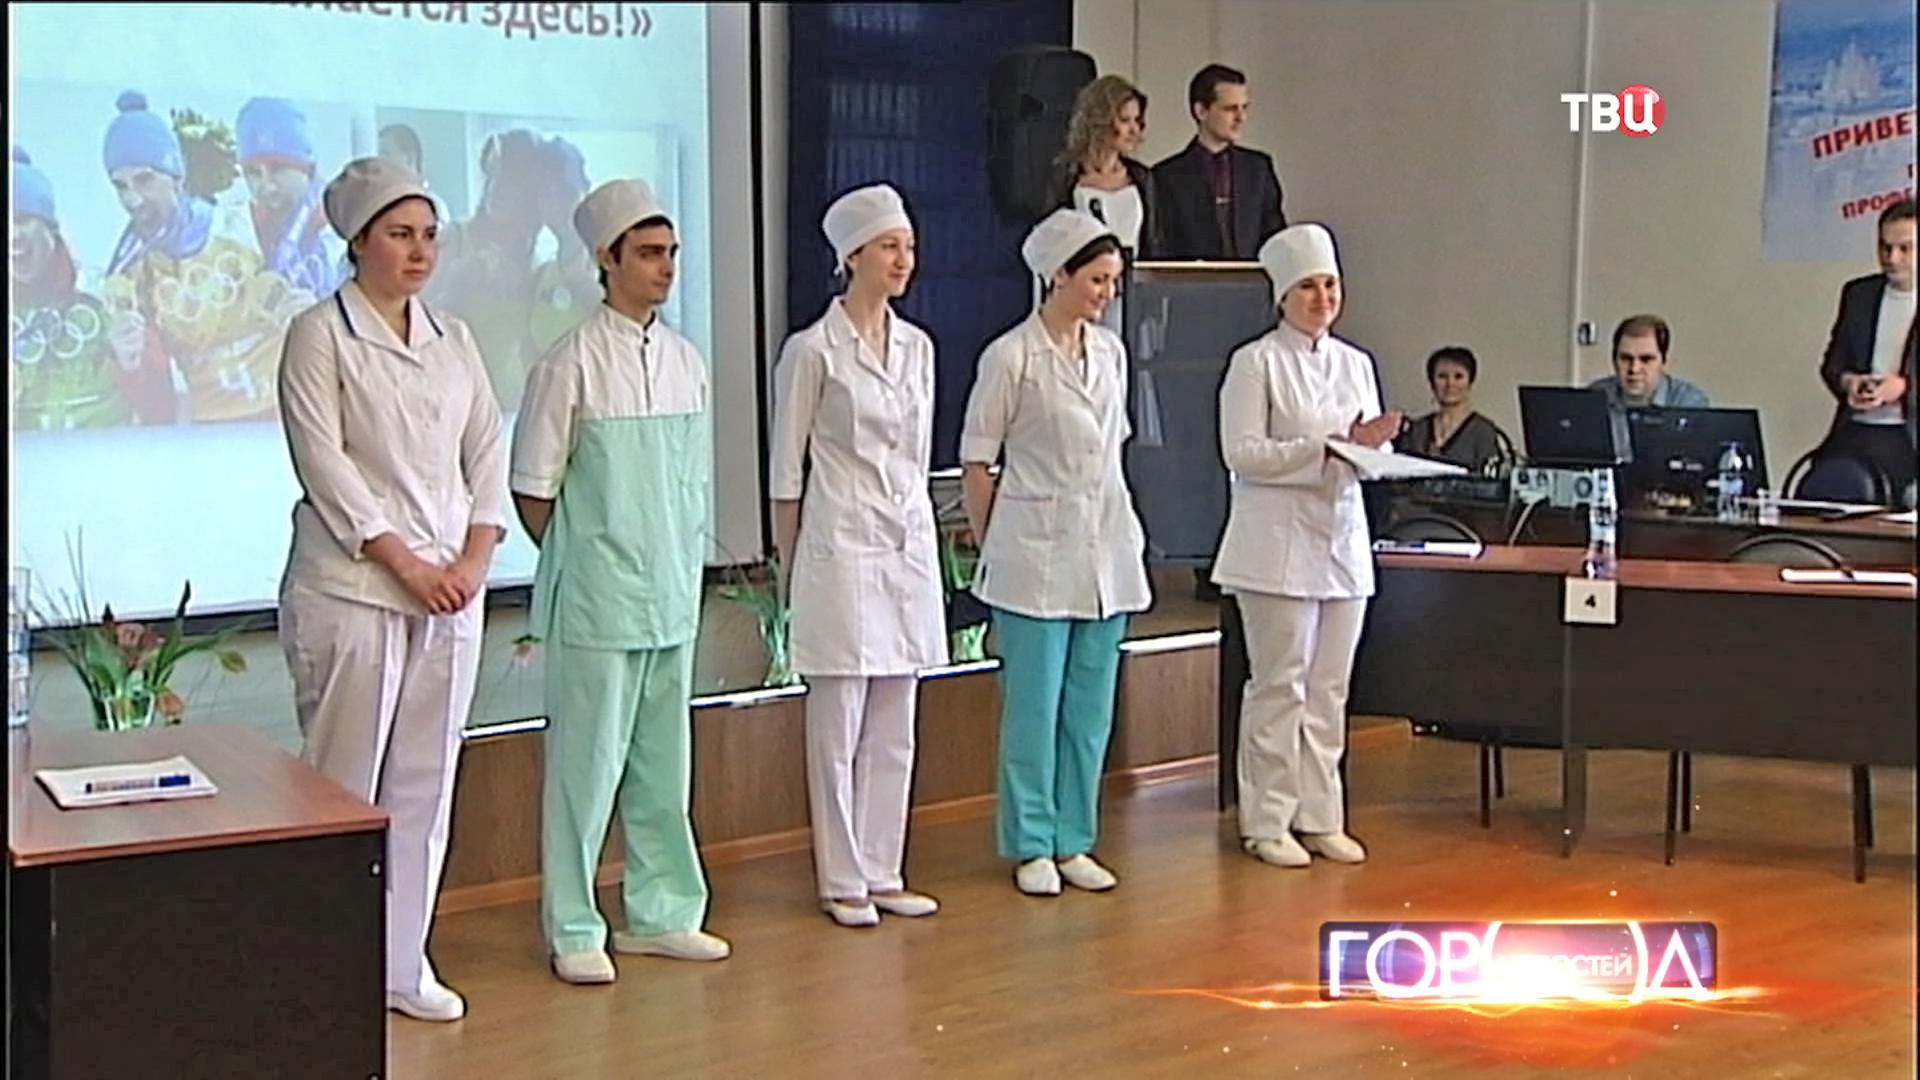 Результаты конкурса медсестер